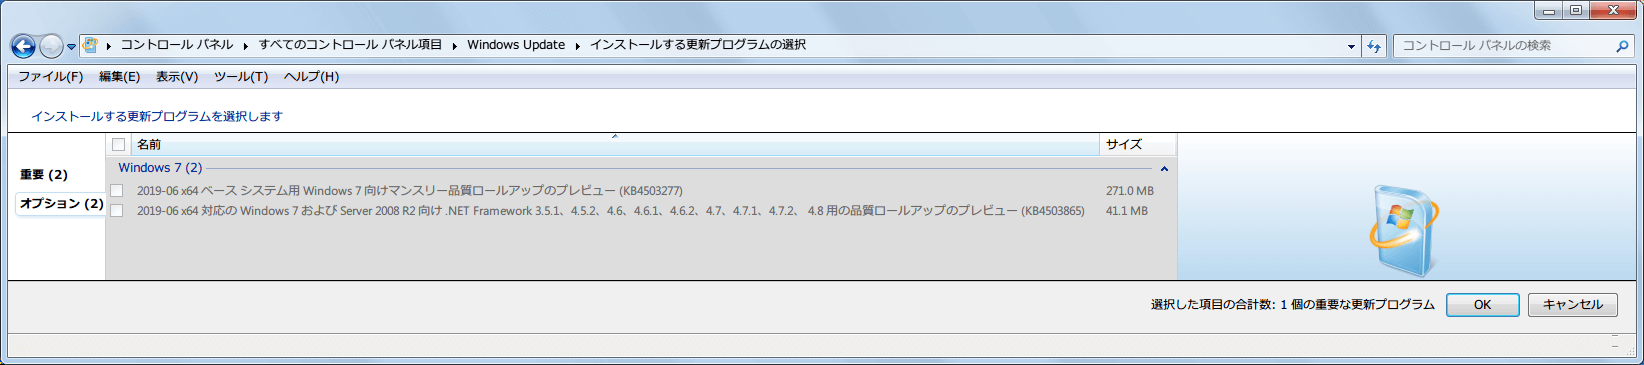 Windows 7 64bit Windows Update オプション 2019年6月分リスト KB4503865 KB4503277 非表示